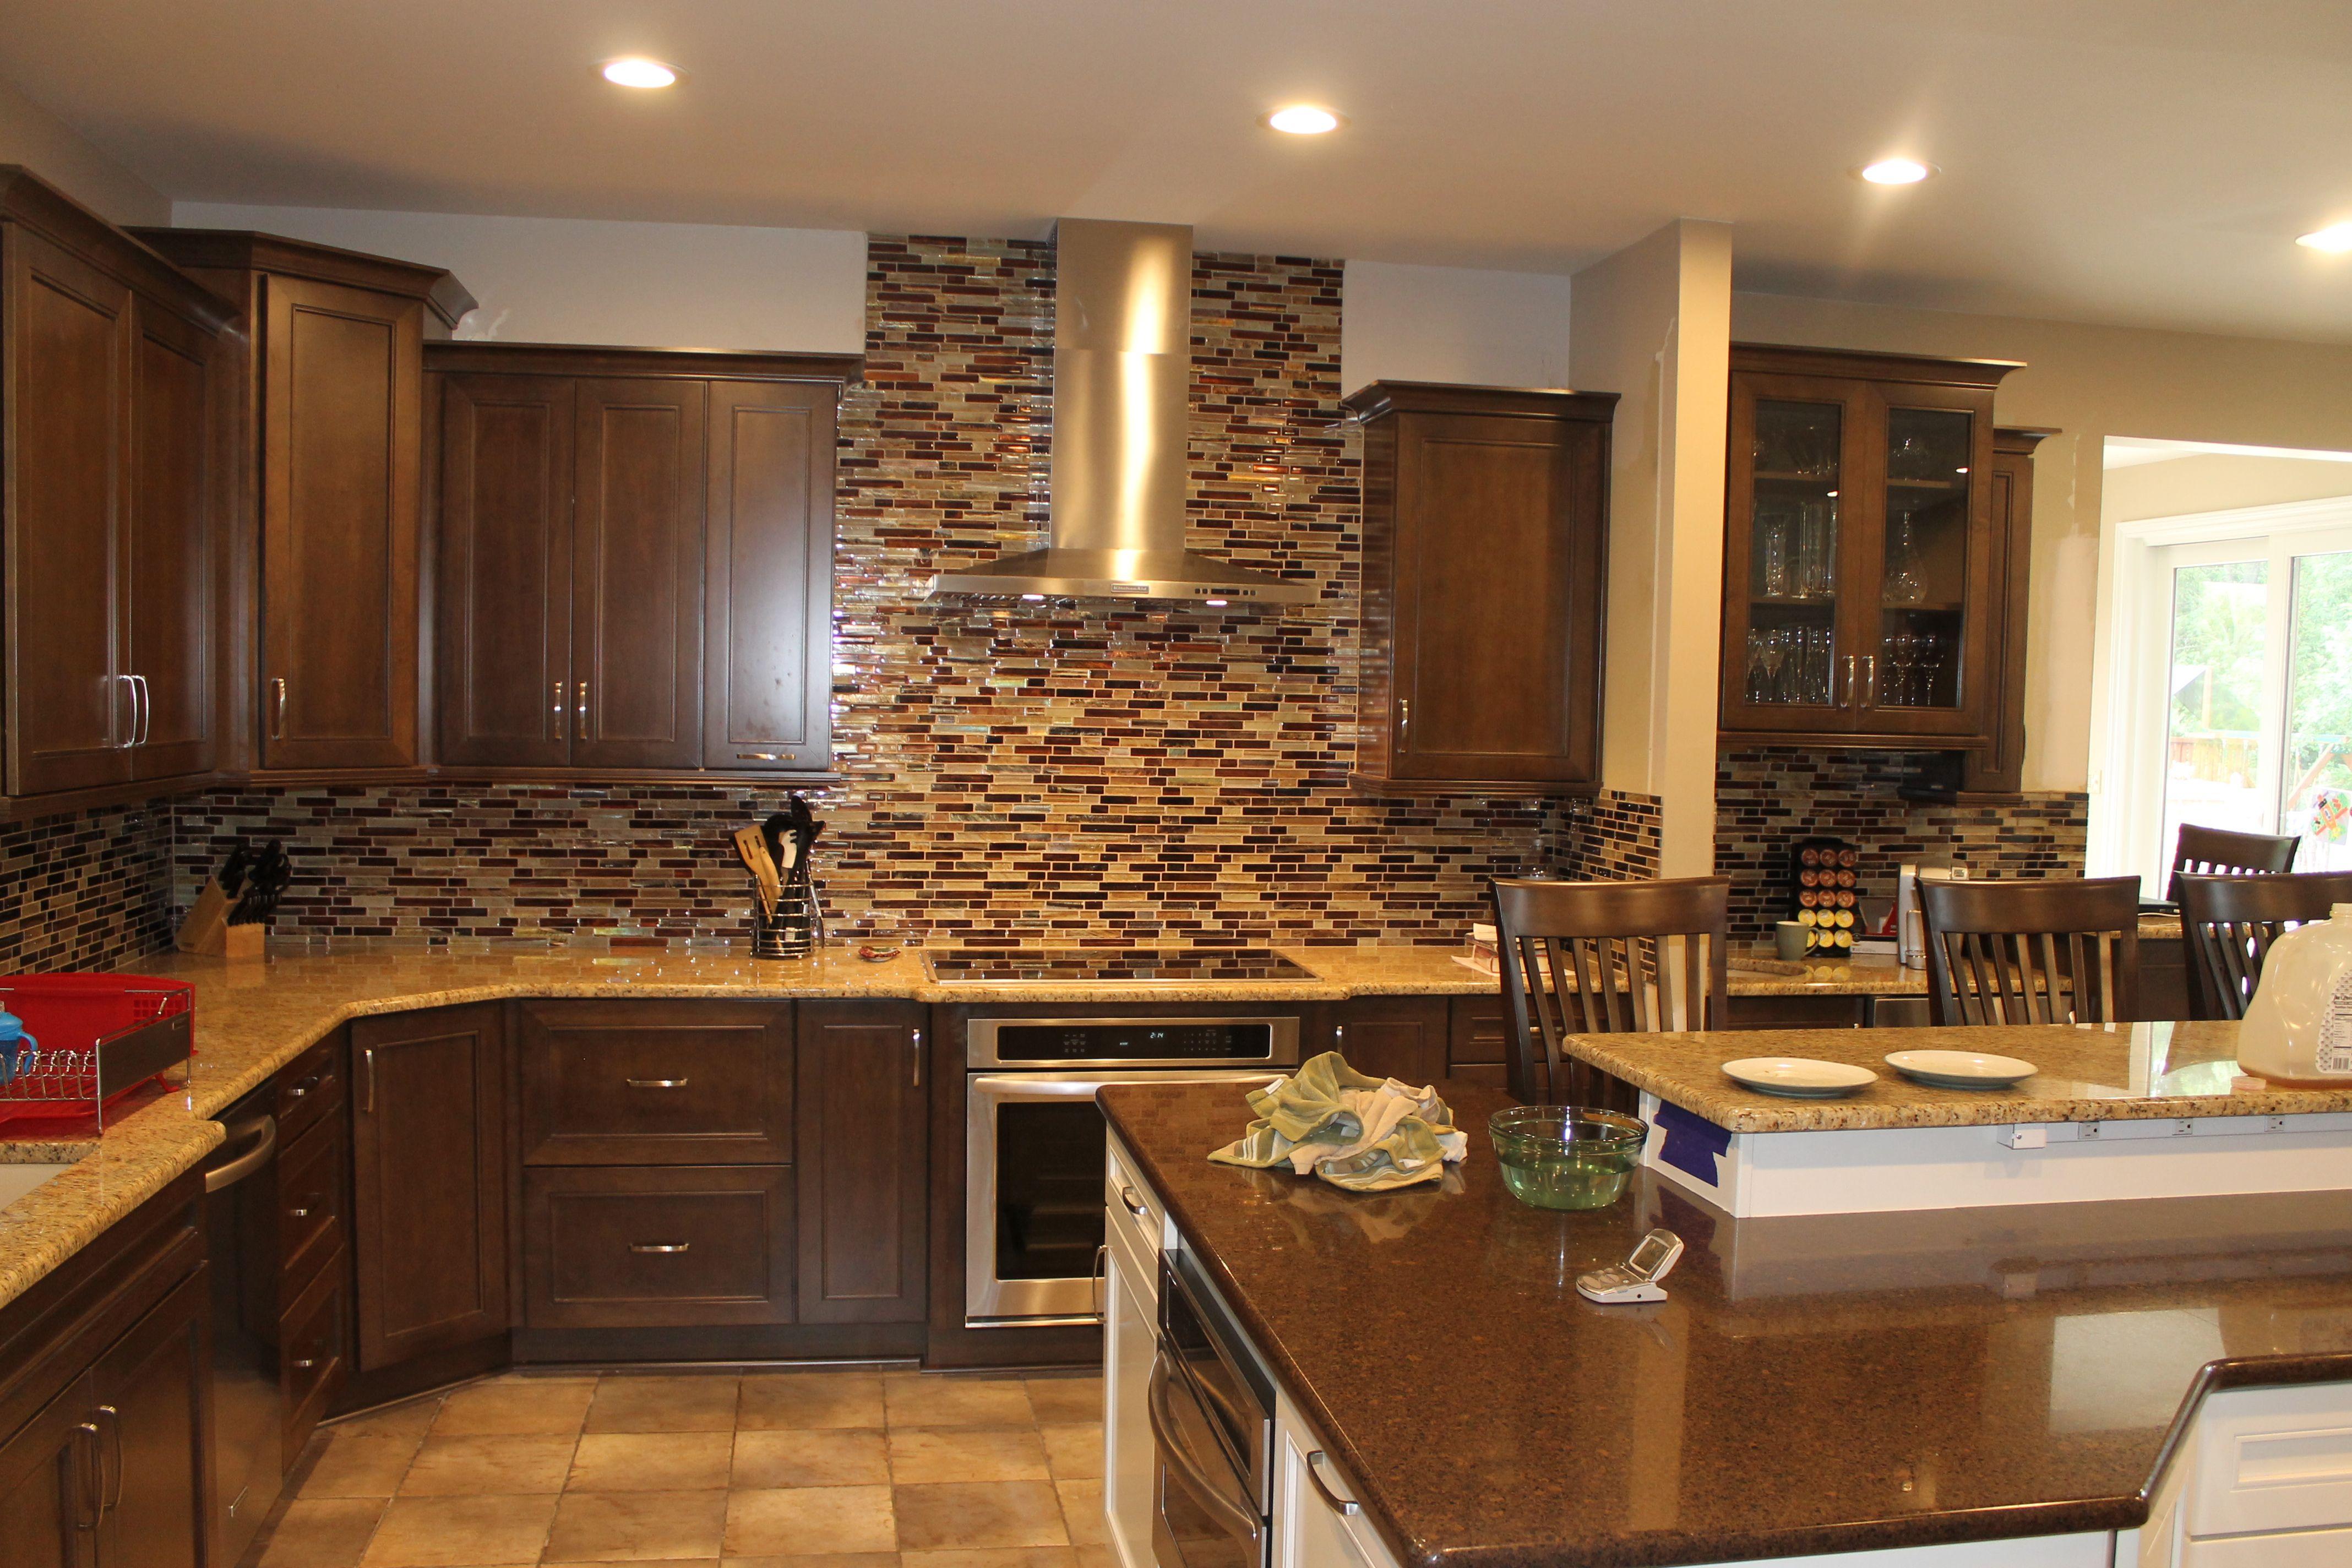 Medium Maple Cabinets with light Granite countertops and ... on Light Maple Cabinets With Black Countertops  id=20195